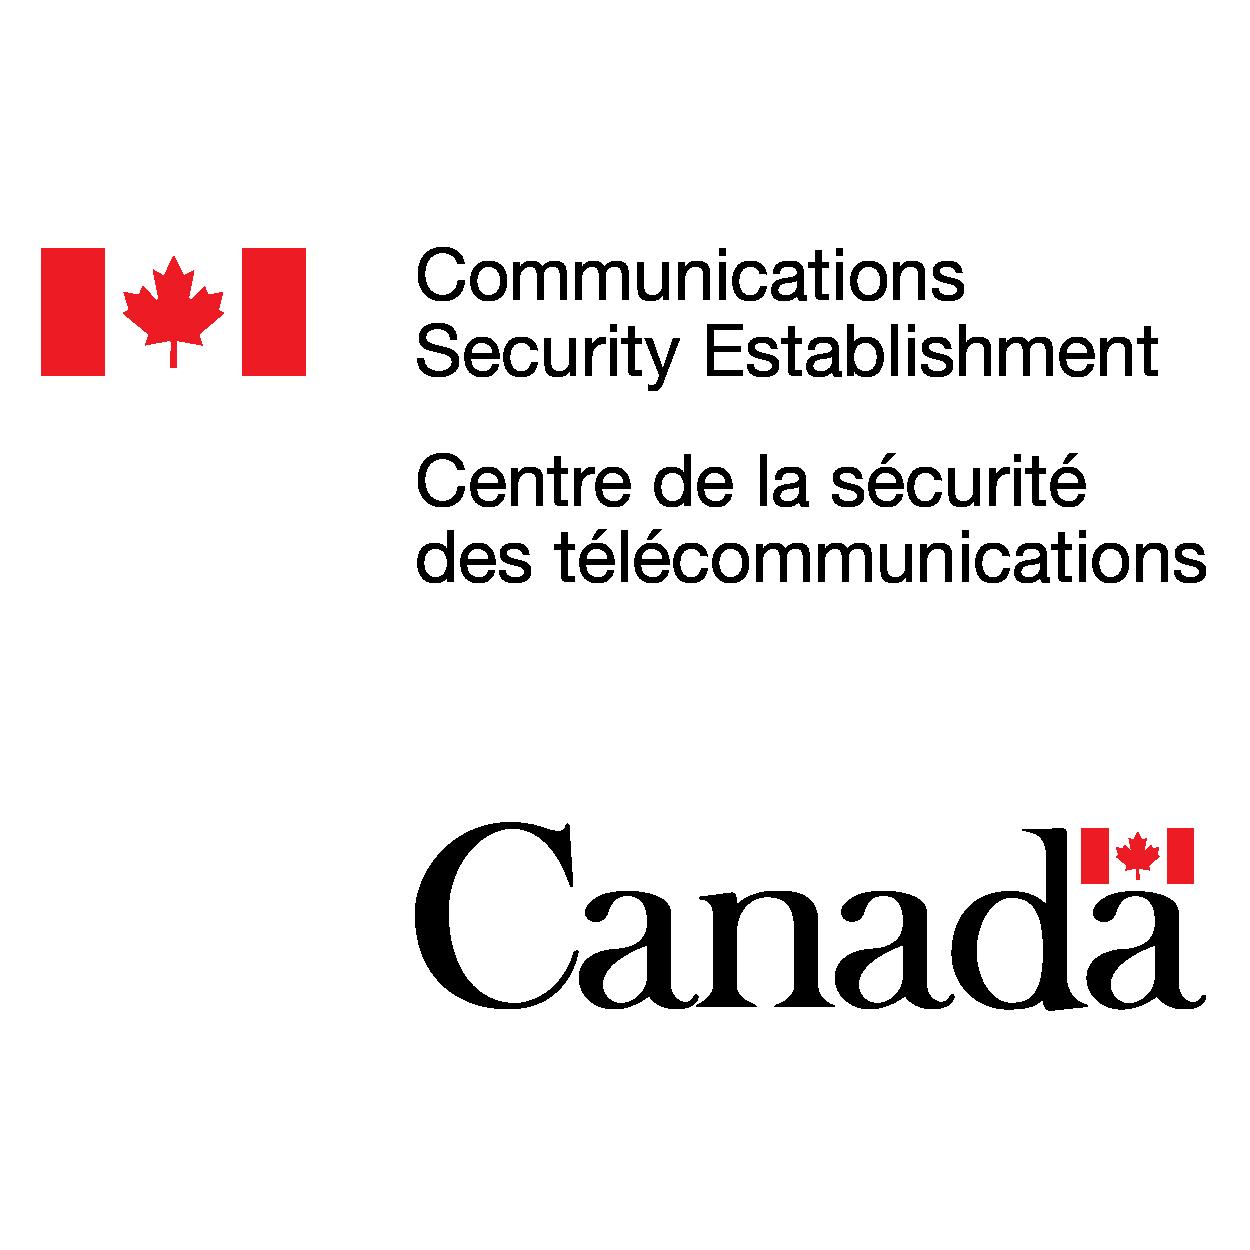 Communications Security Establishment logo